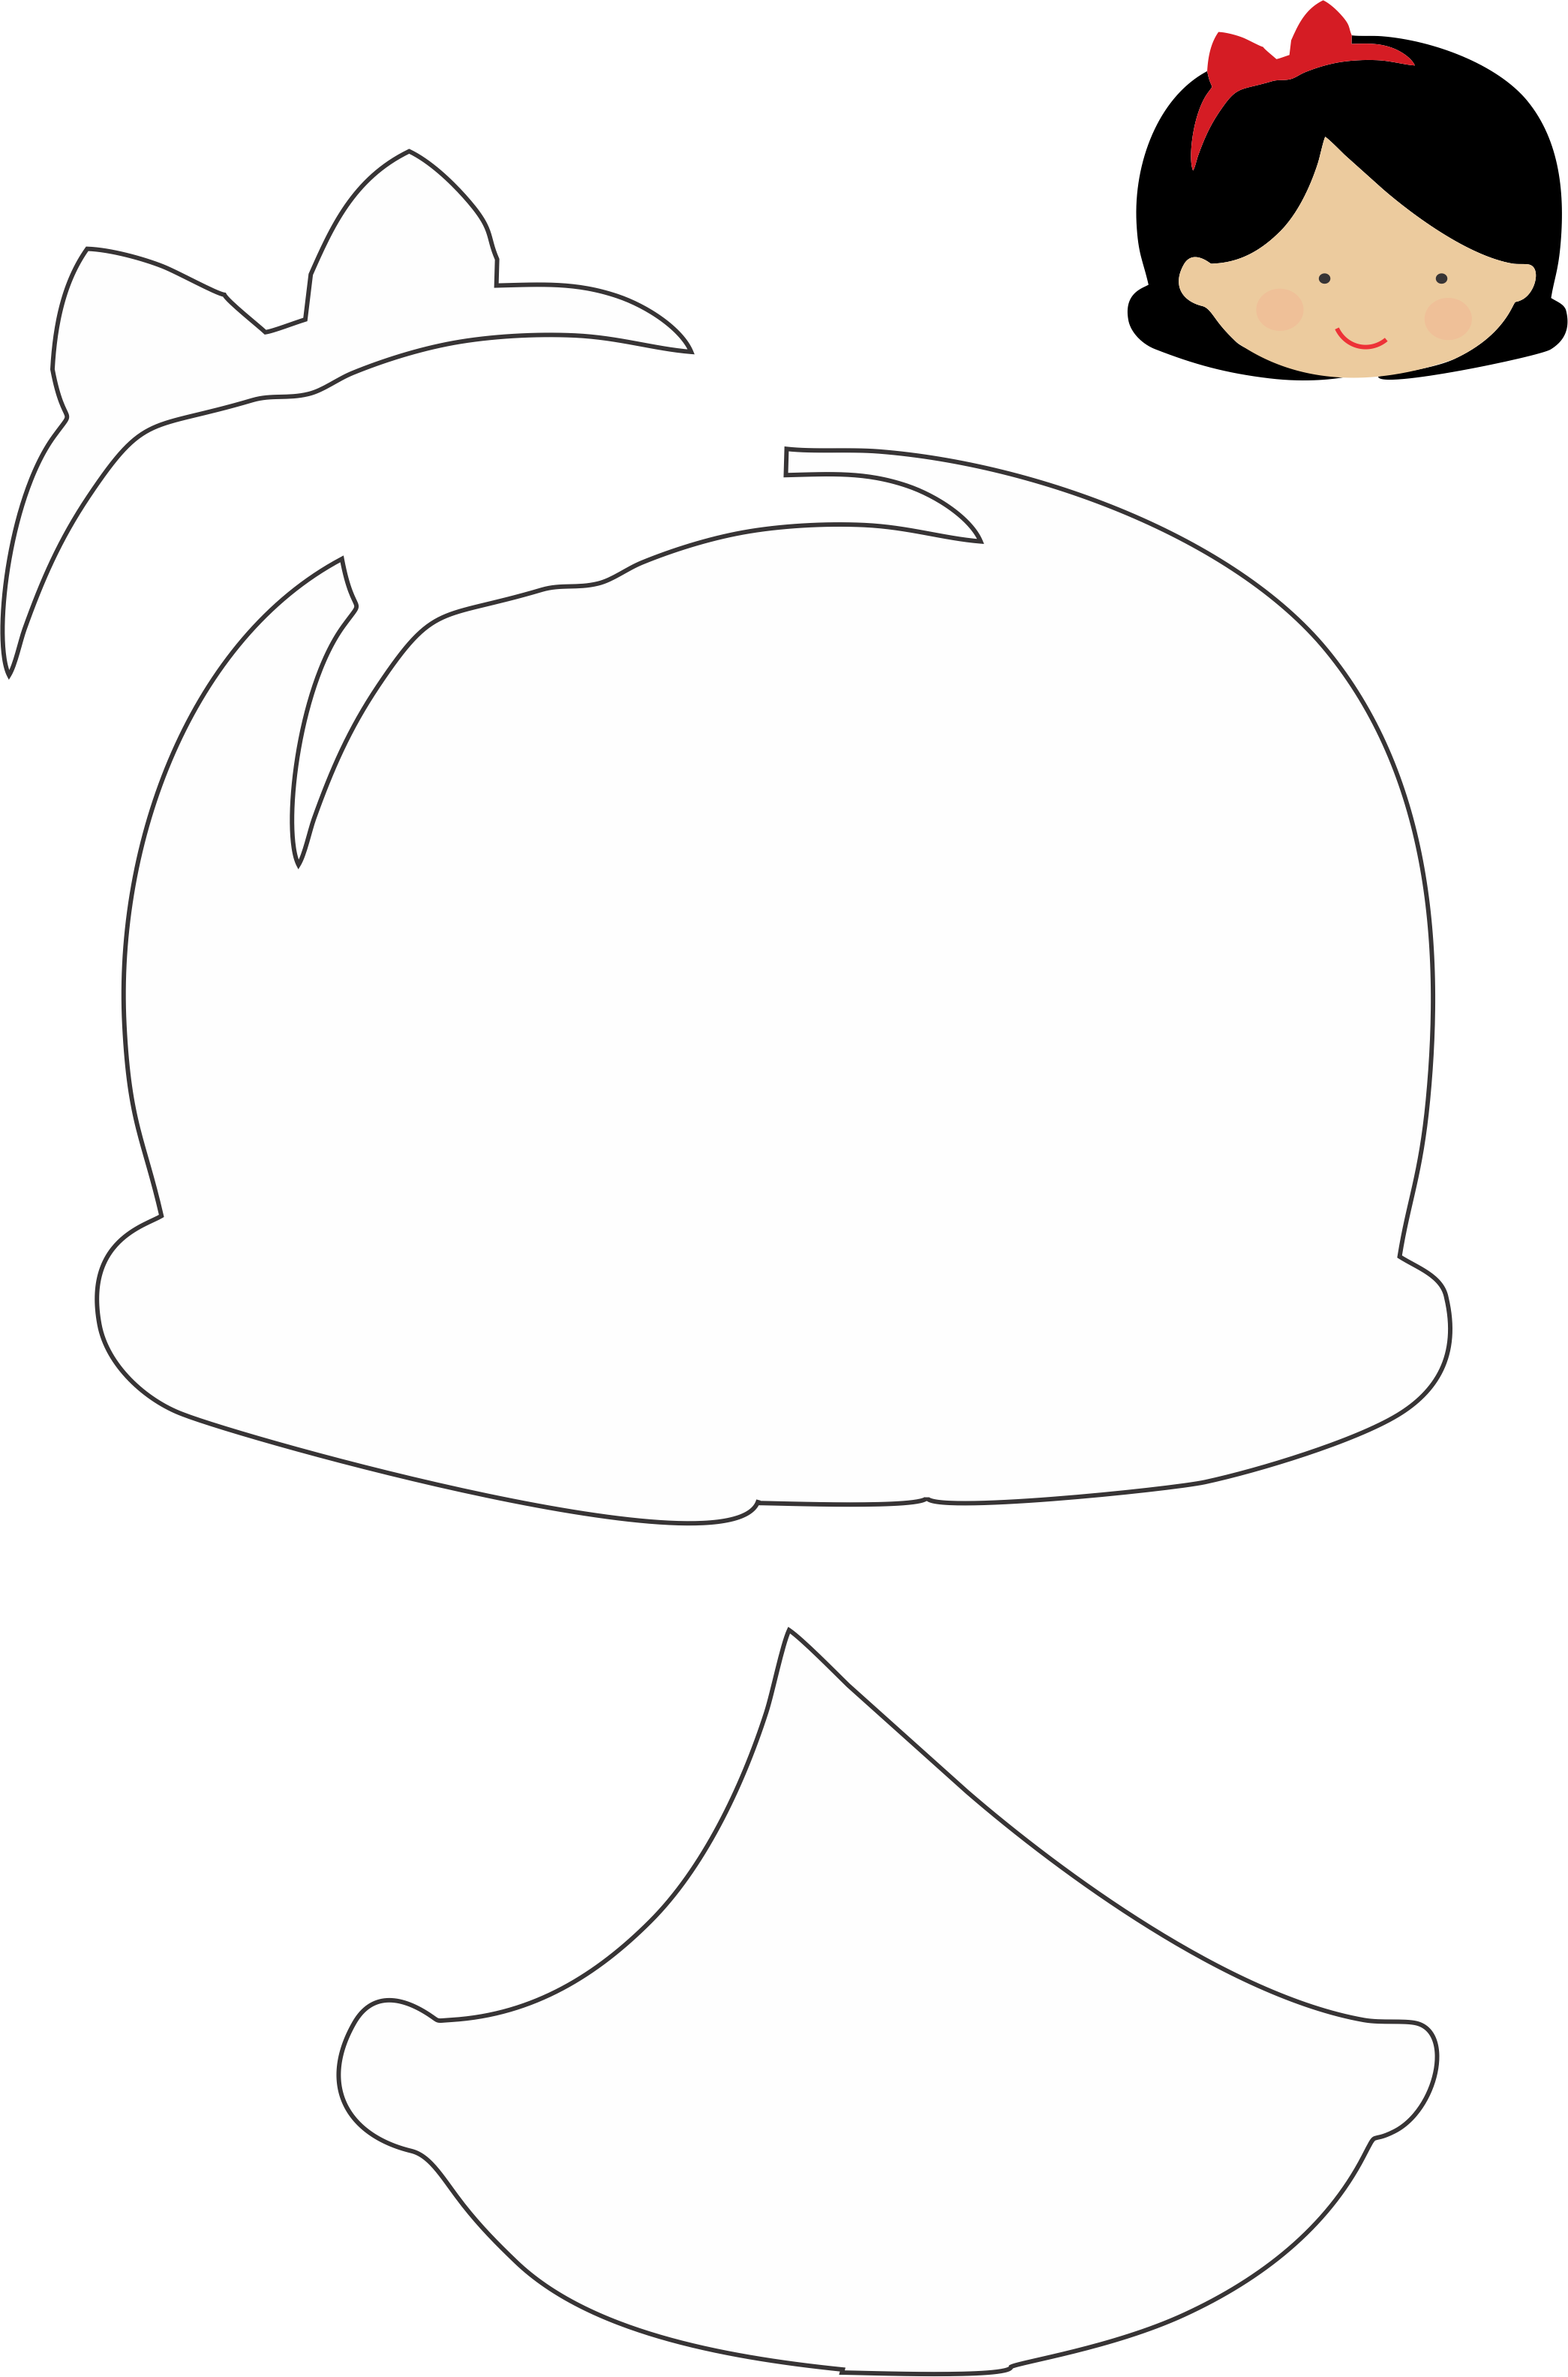 DIY :: Felt - Snow White - Molde Branca de Neve - Feltro #disneyprincess #feltro